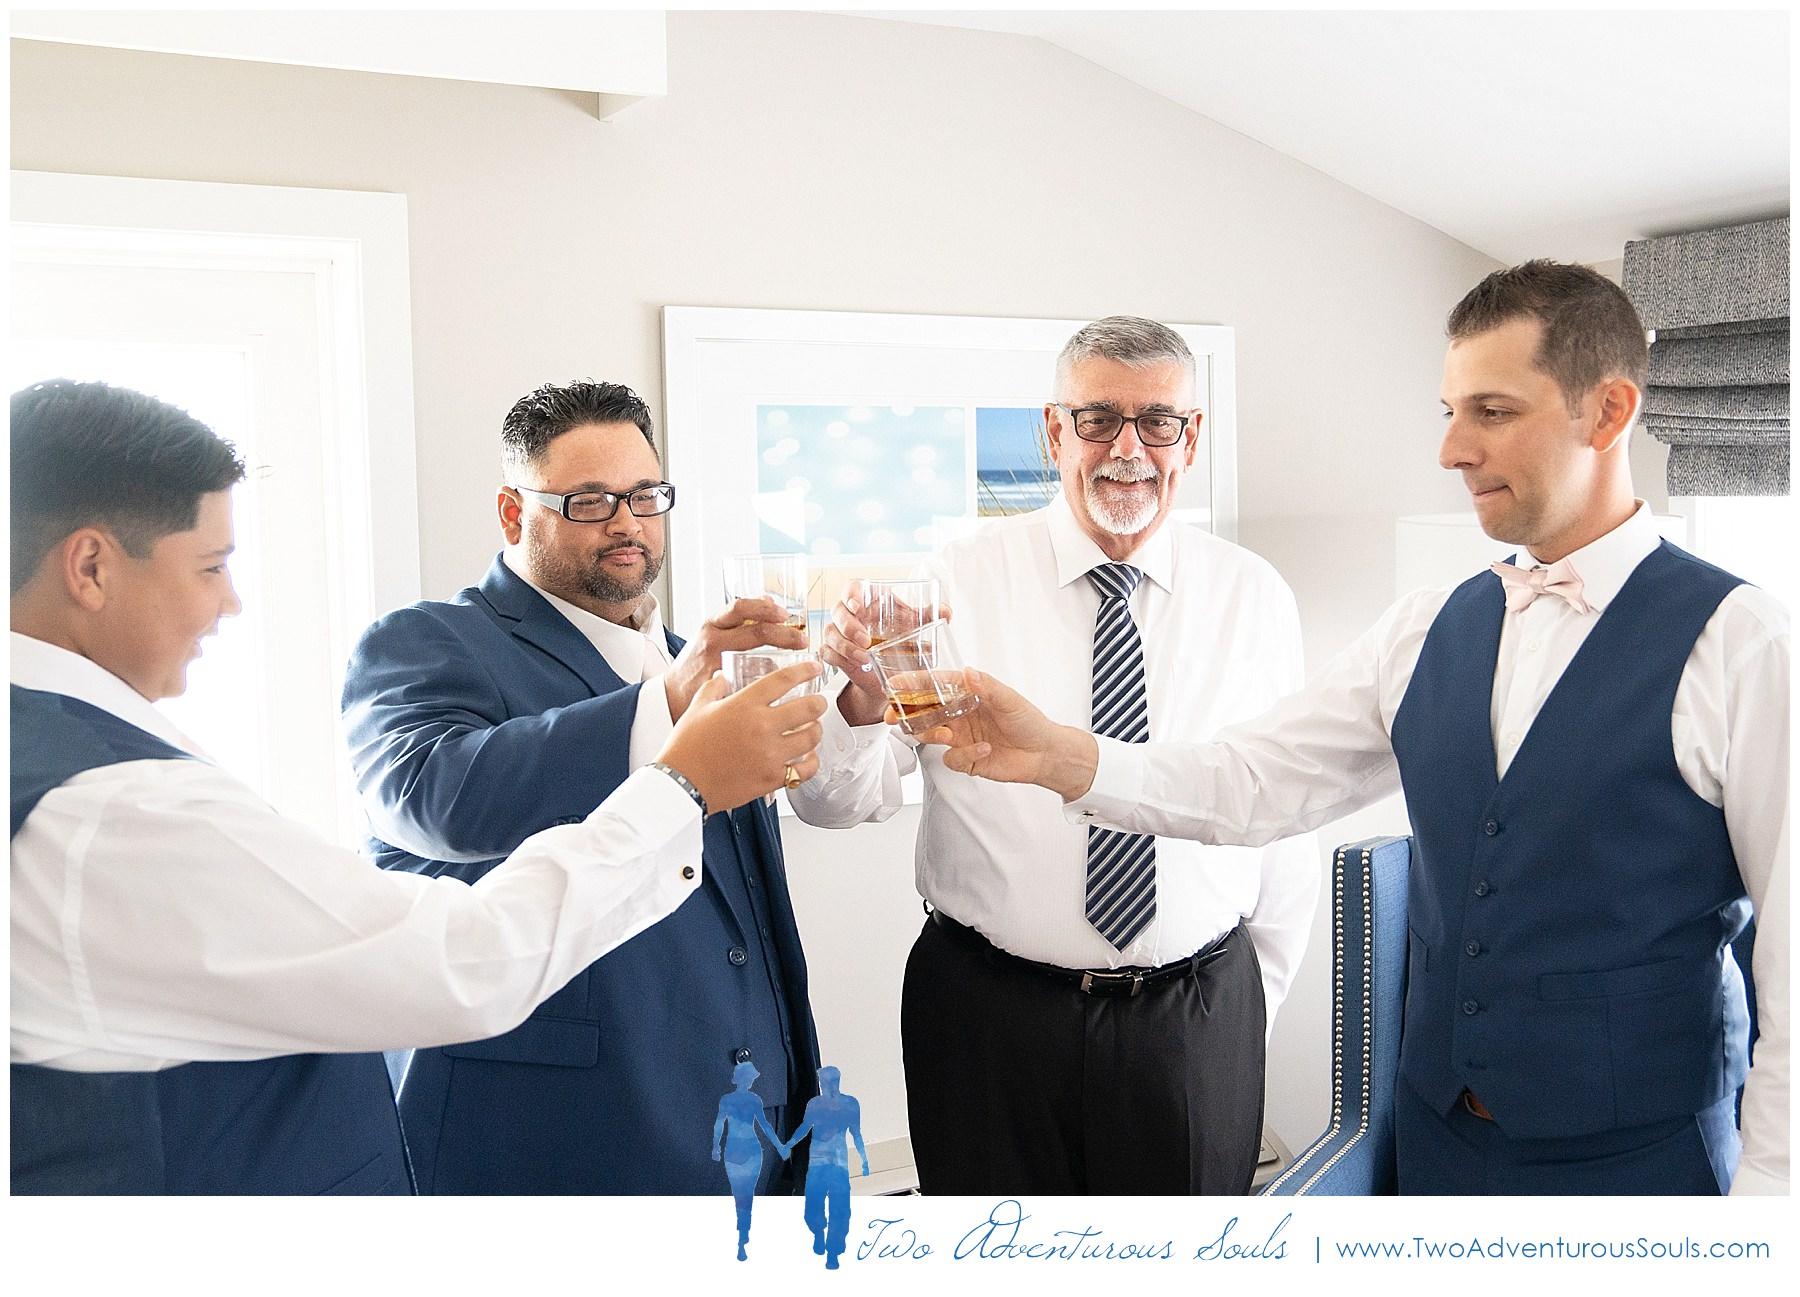 Connecticut Wedding Photographers, Lace Factory Wedding Photographers, Two Adventurous Souls - 083119_0008.jpg